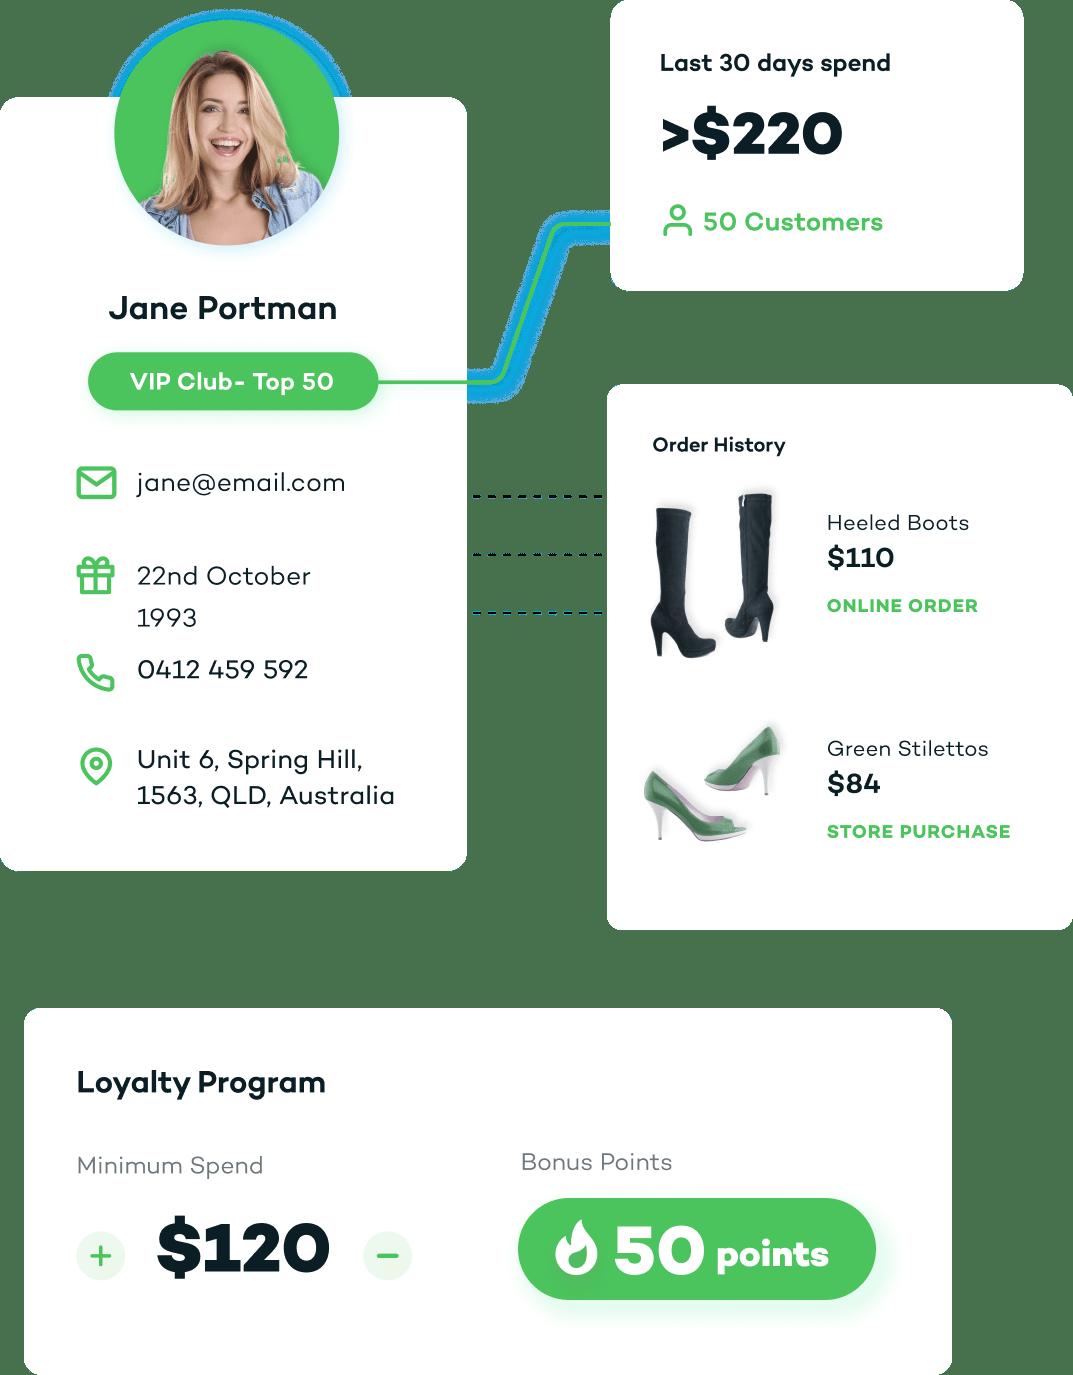 pos system for startup footwear retailer